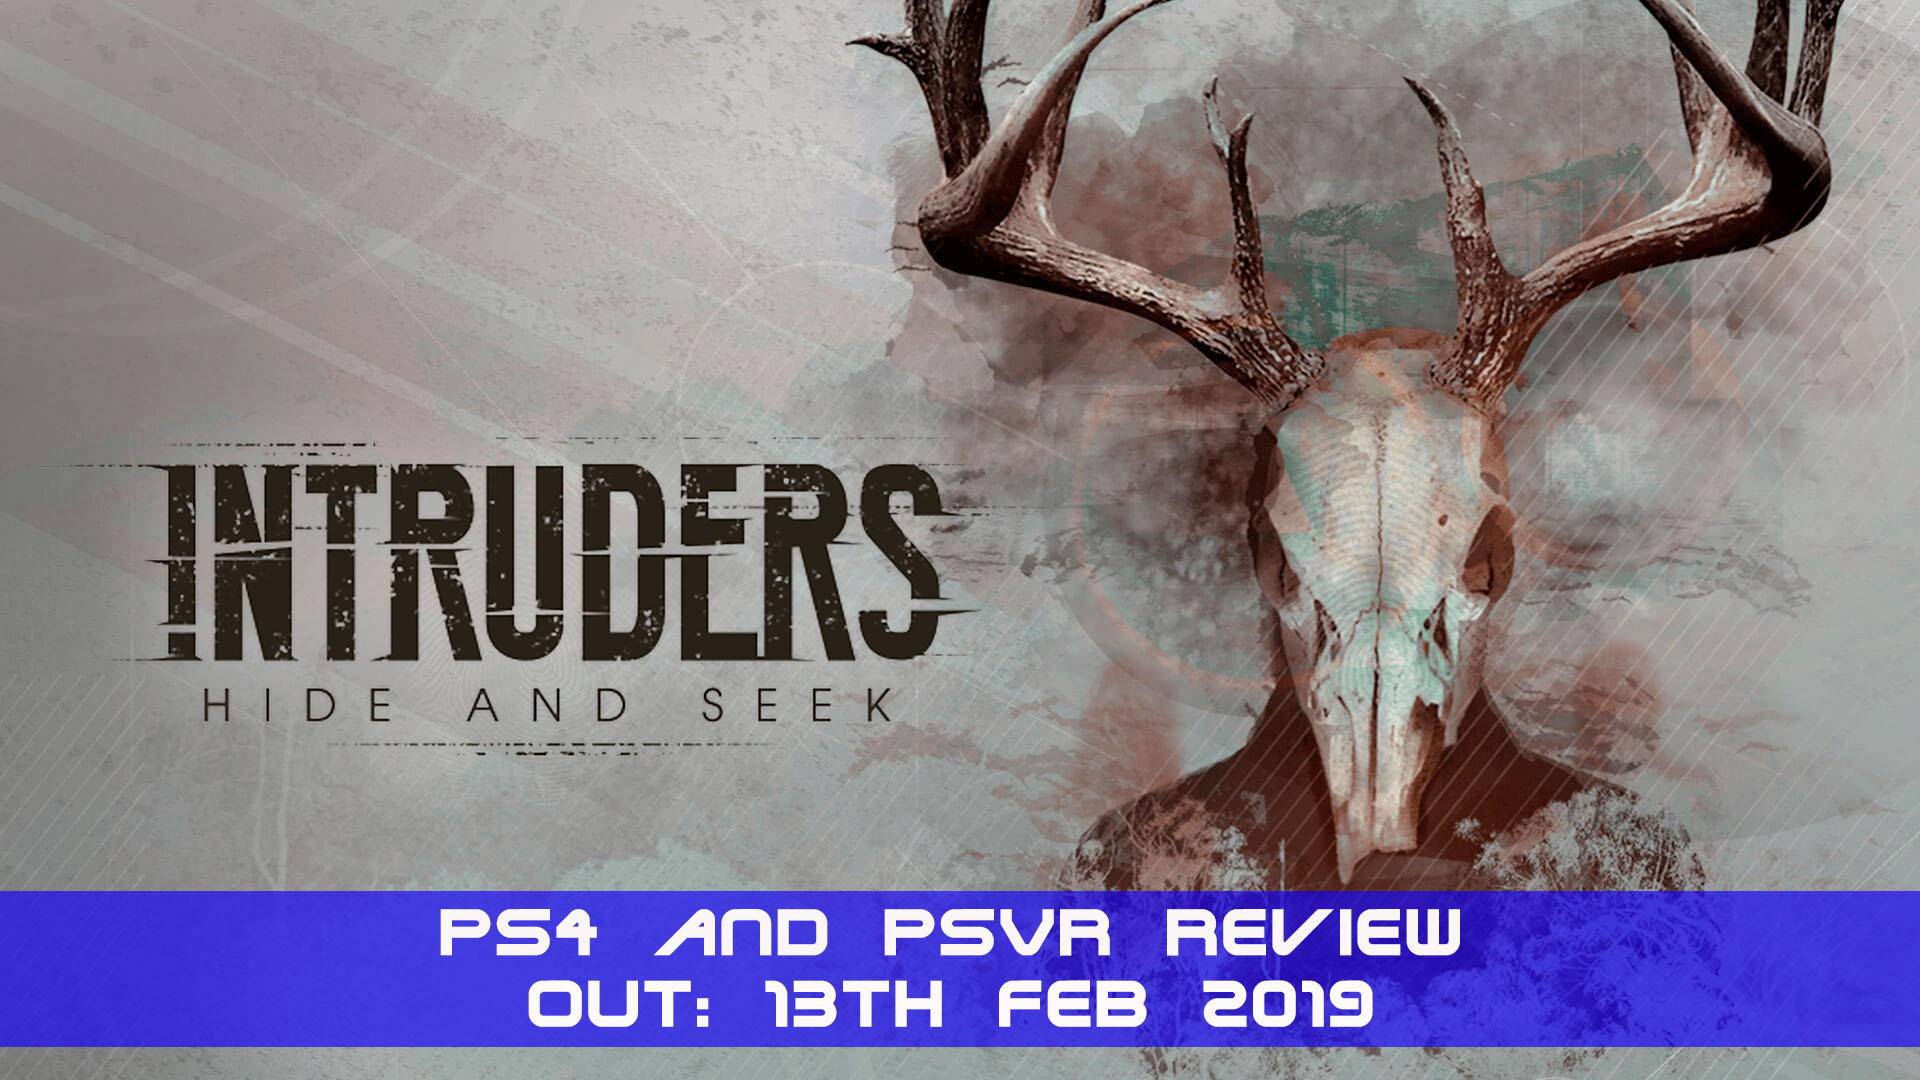 Intruders: Hide and Seek (PS4, PSVR) Review